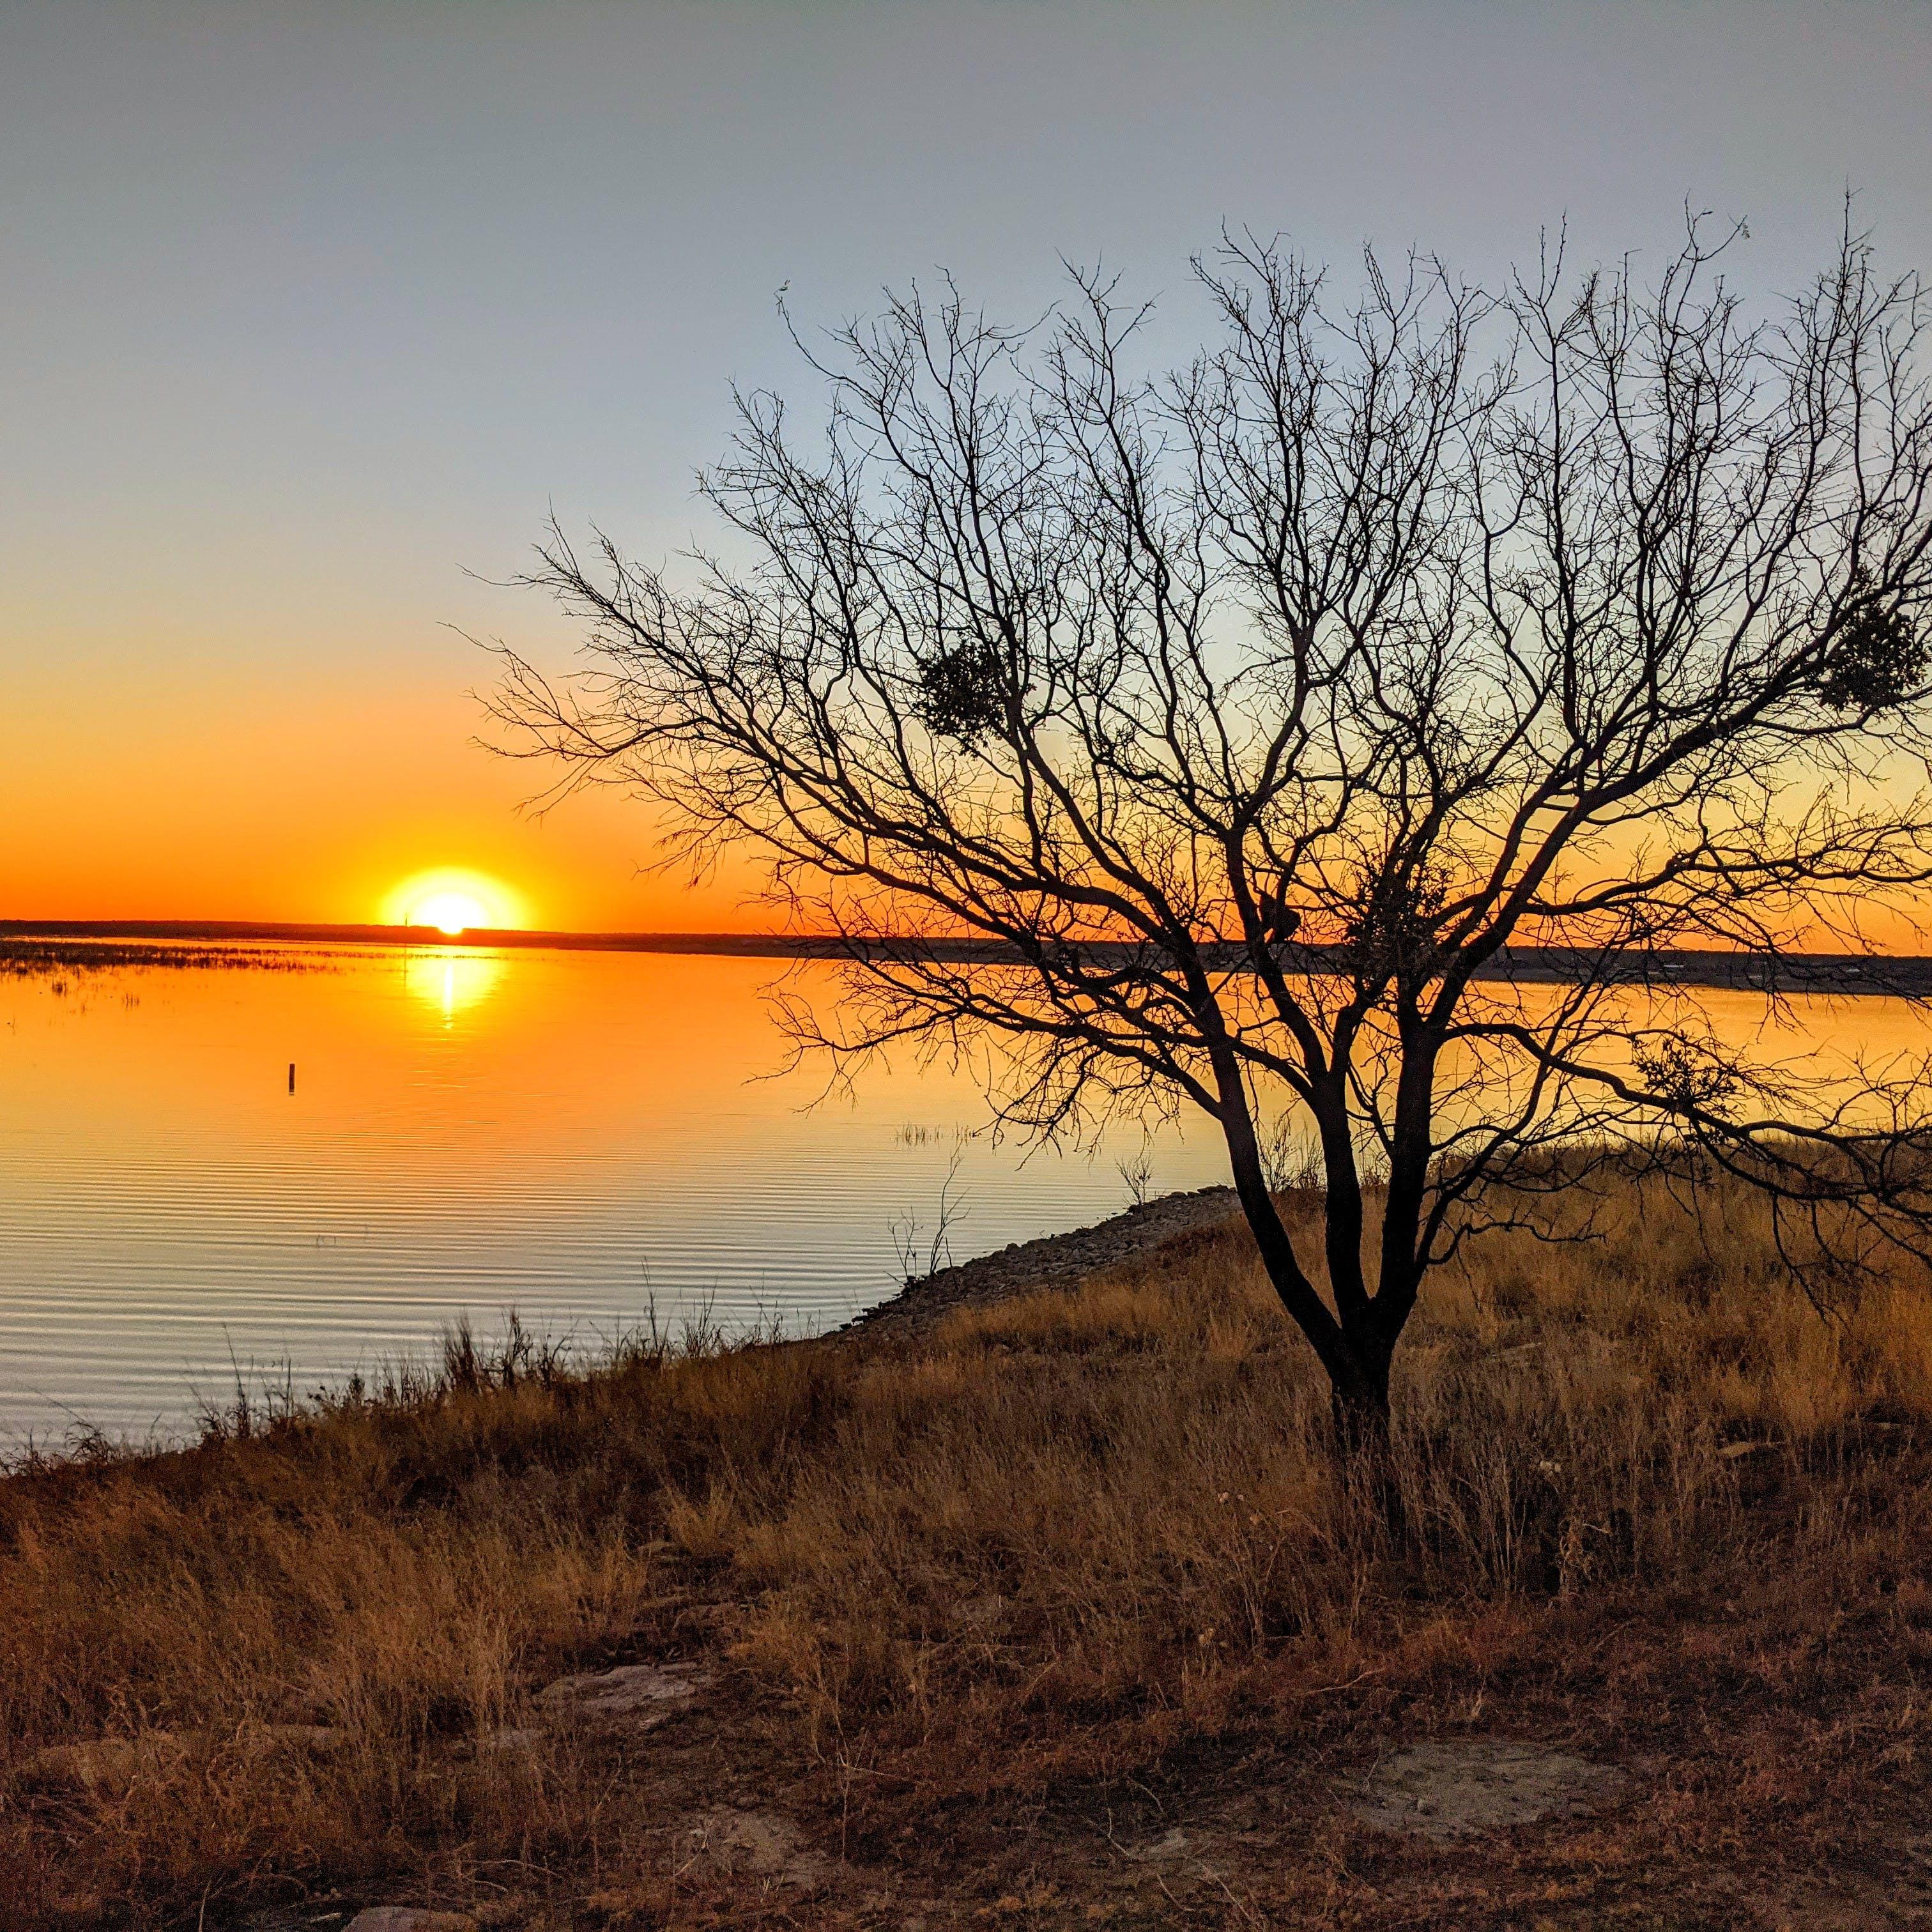 Concho Park - O.H. Ivie Reservoir, TX | The Dyrt